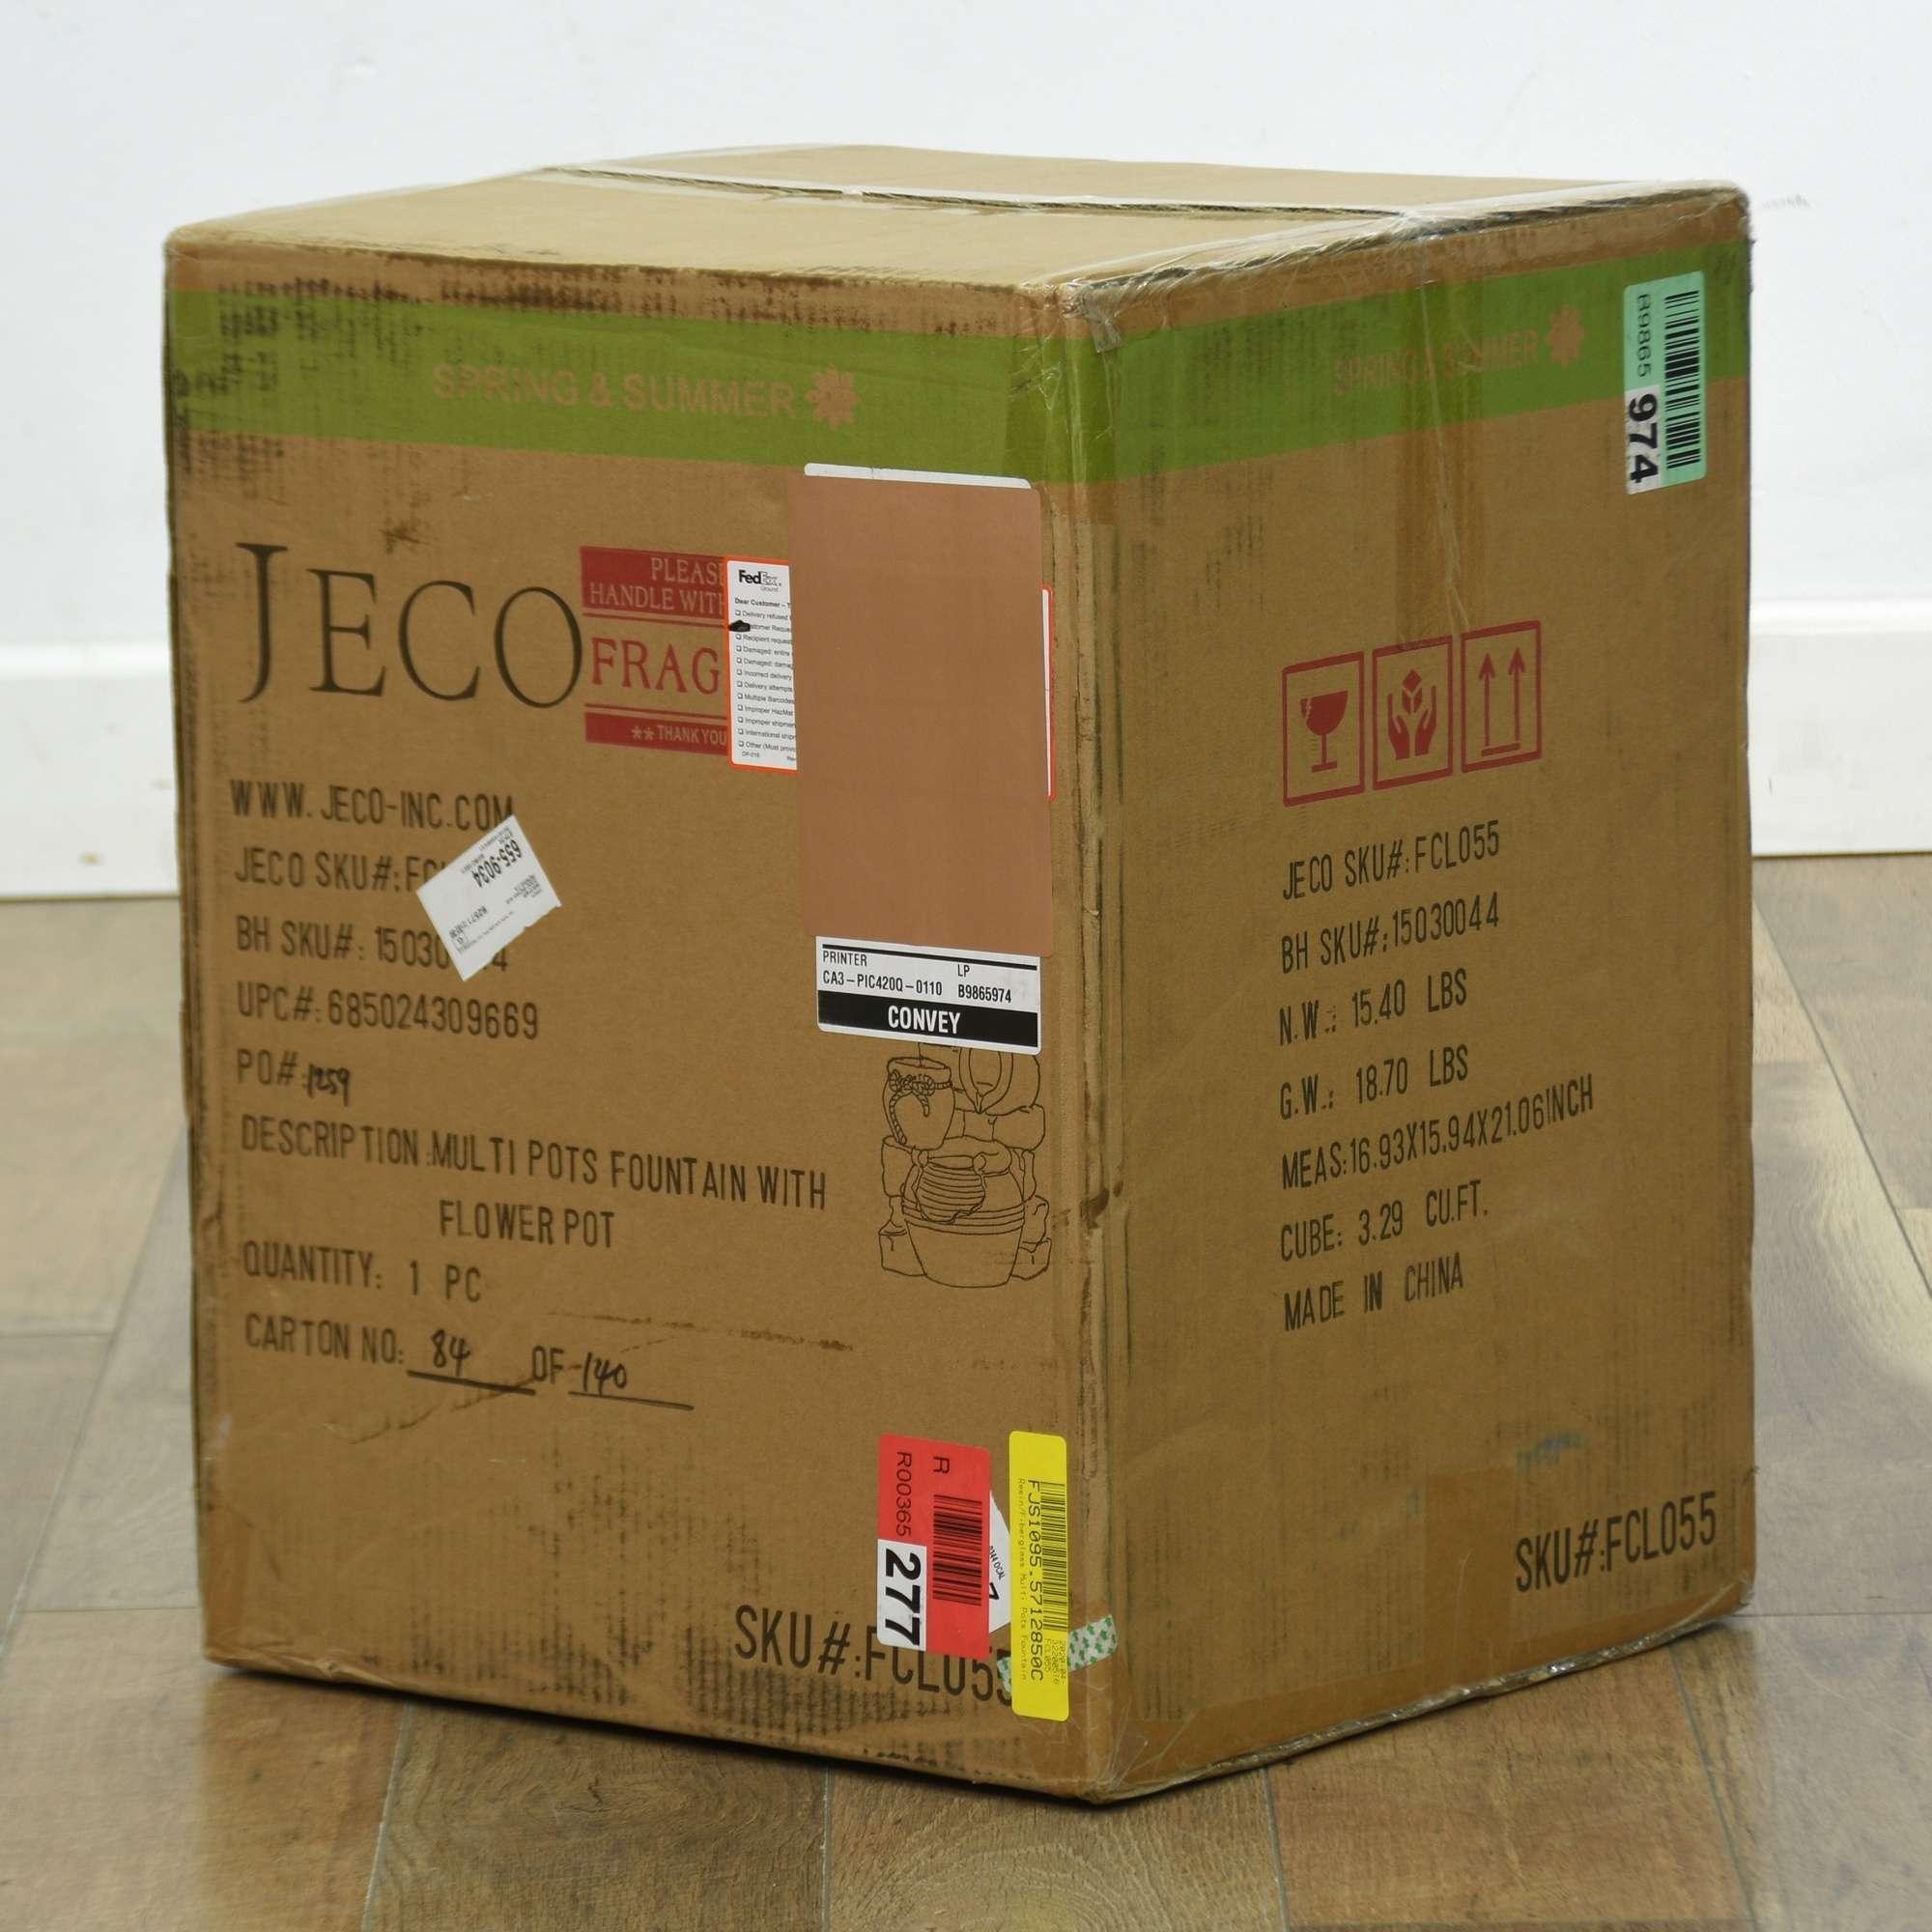 Jeco Inc Resin Fiberglass Multi Pots Fountain Loveseat Online Auctions San Diego